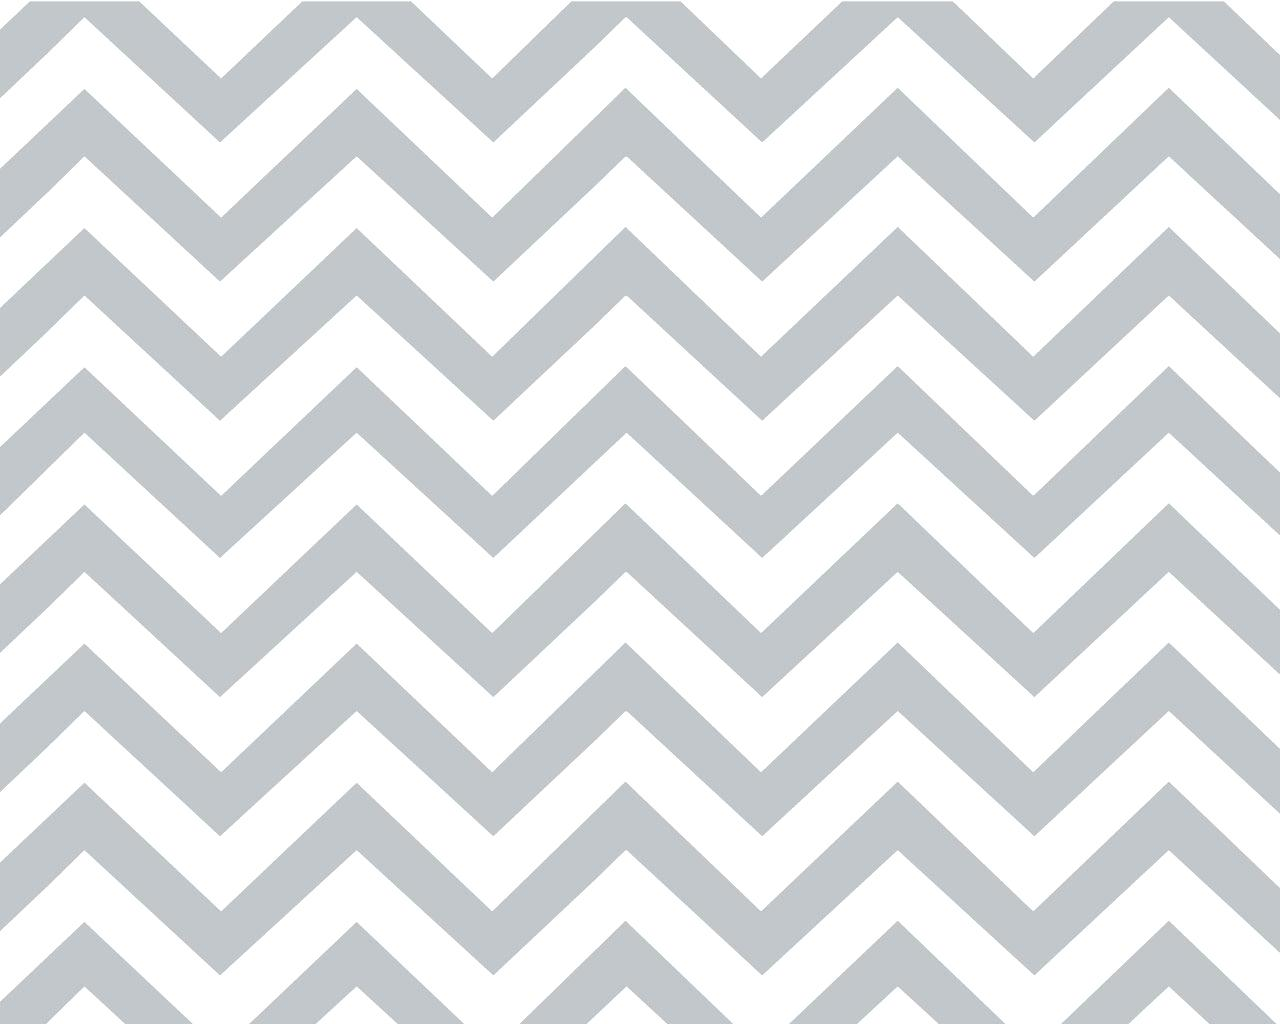 Chevron clipart pattern, Chevron pattern Transparent FREE.